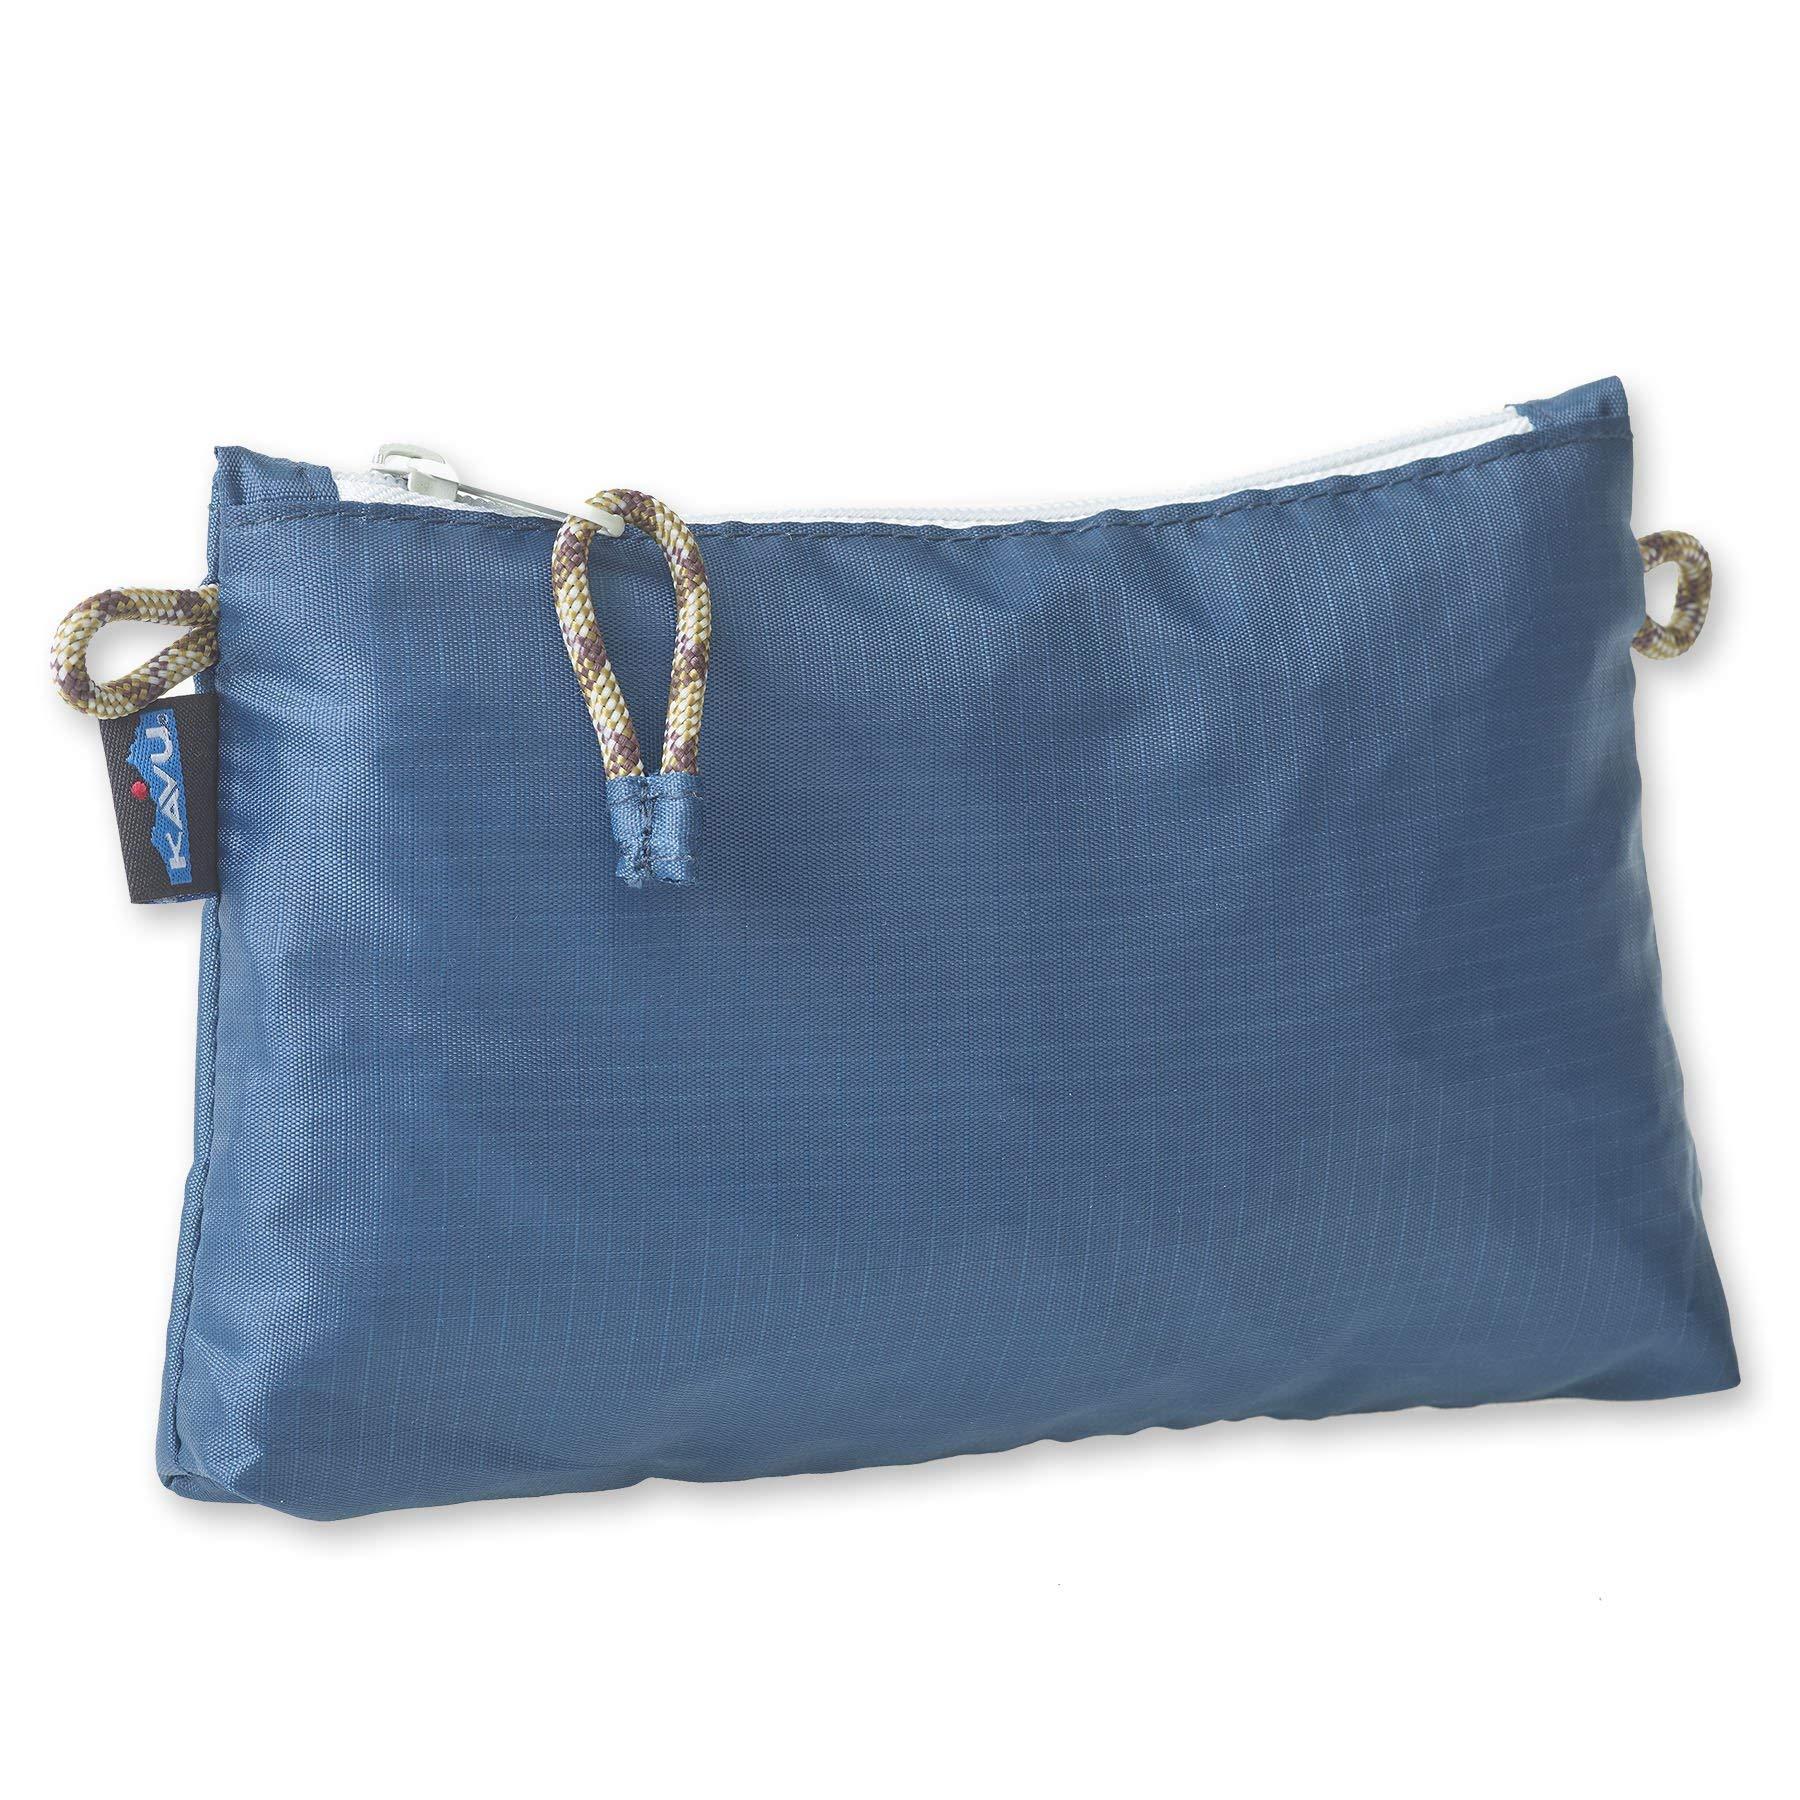 KAVU Ragged Ridge Zip Accessory Pouch Water Resistant Travel Bag - Sapphire